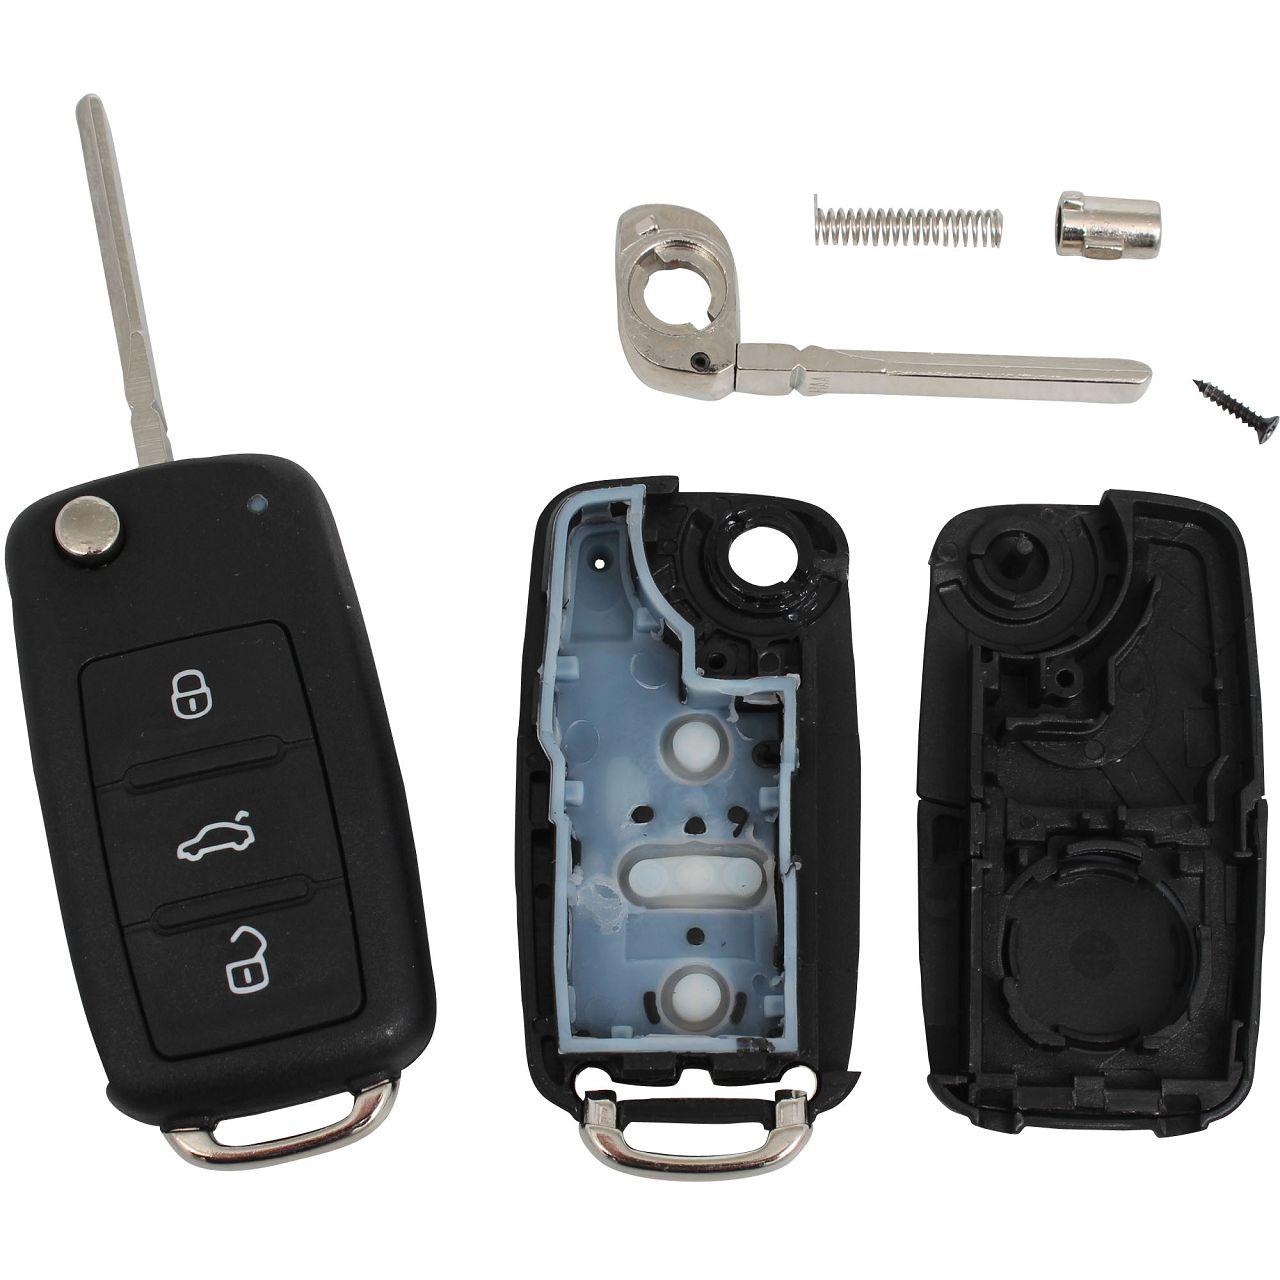 1x Schlüsselgehäuse + Schlüsselrohling 3-Tasten VW Golf 6 7 Passat Polo Tiguan Touran T5